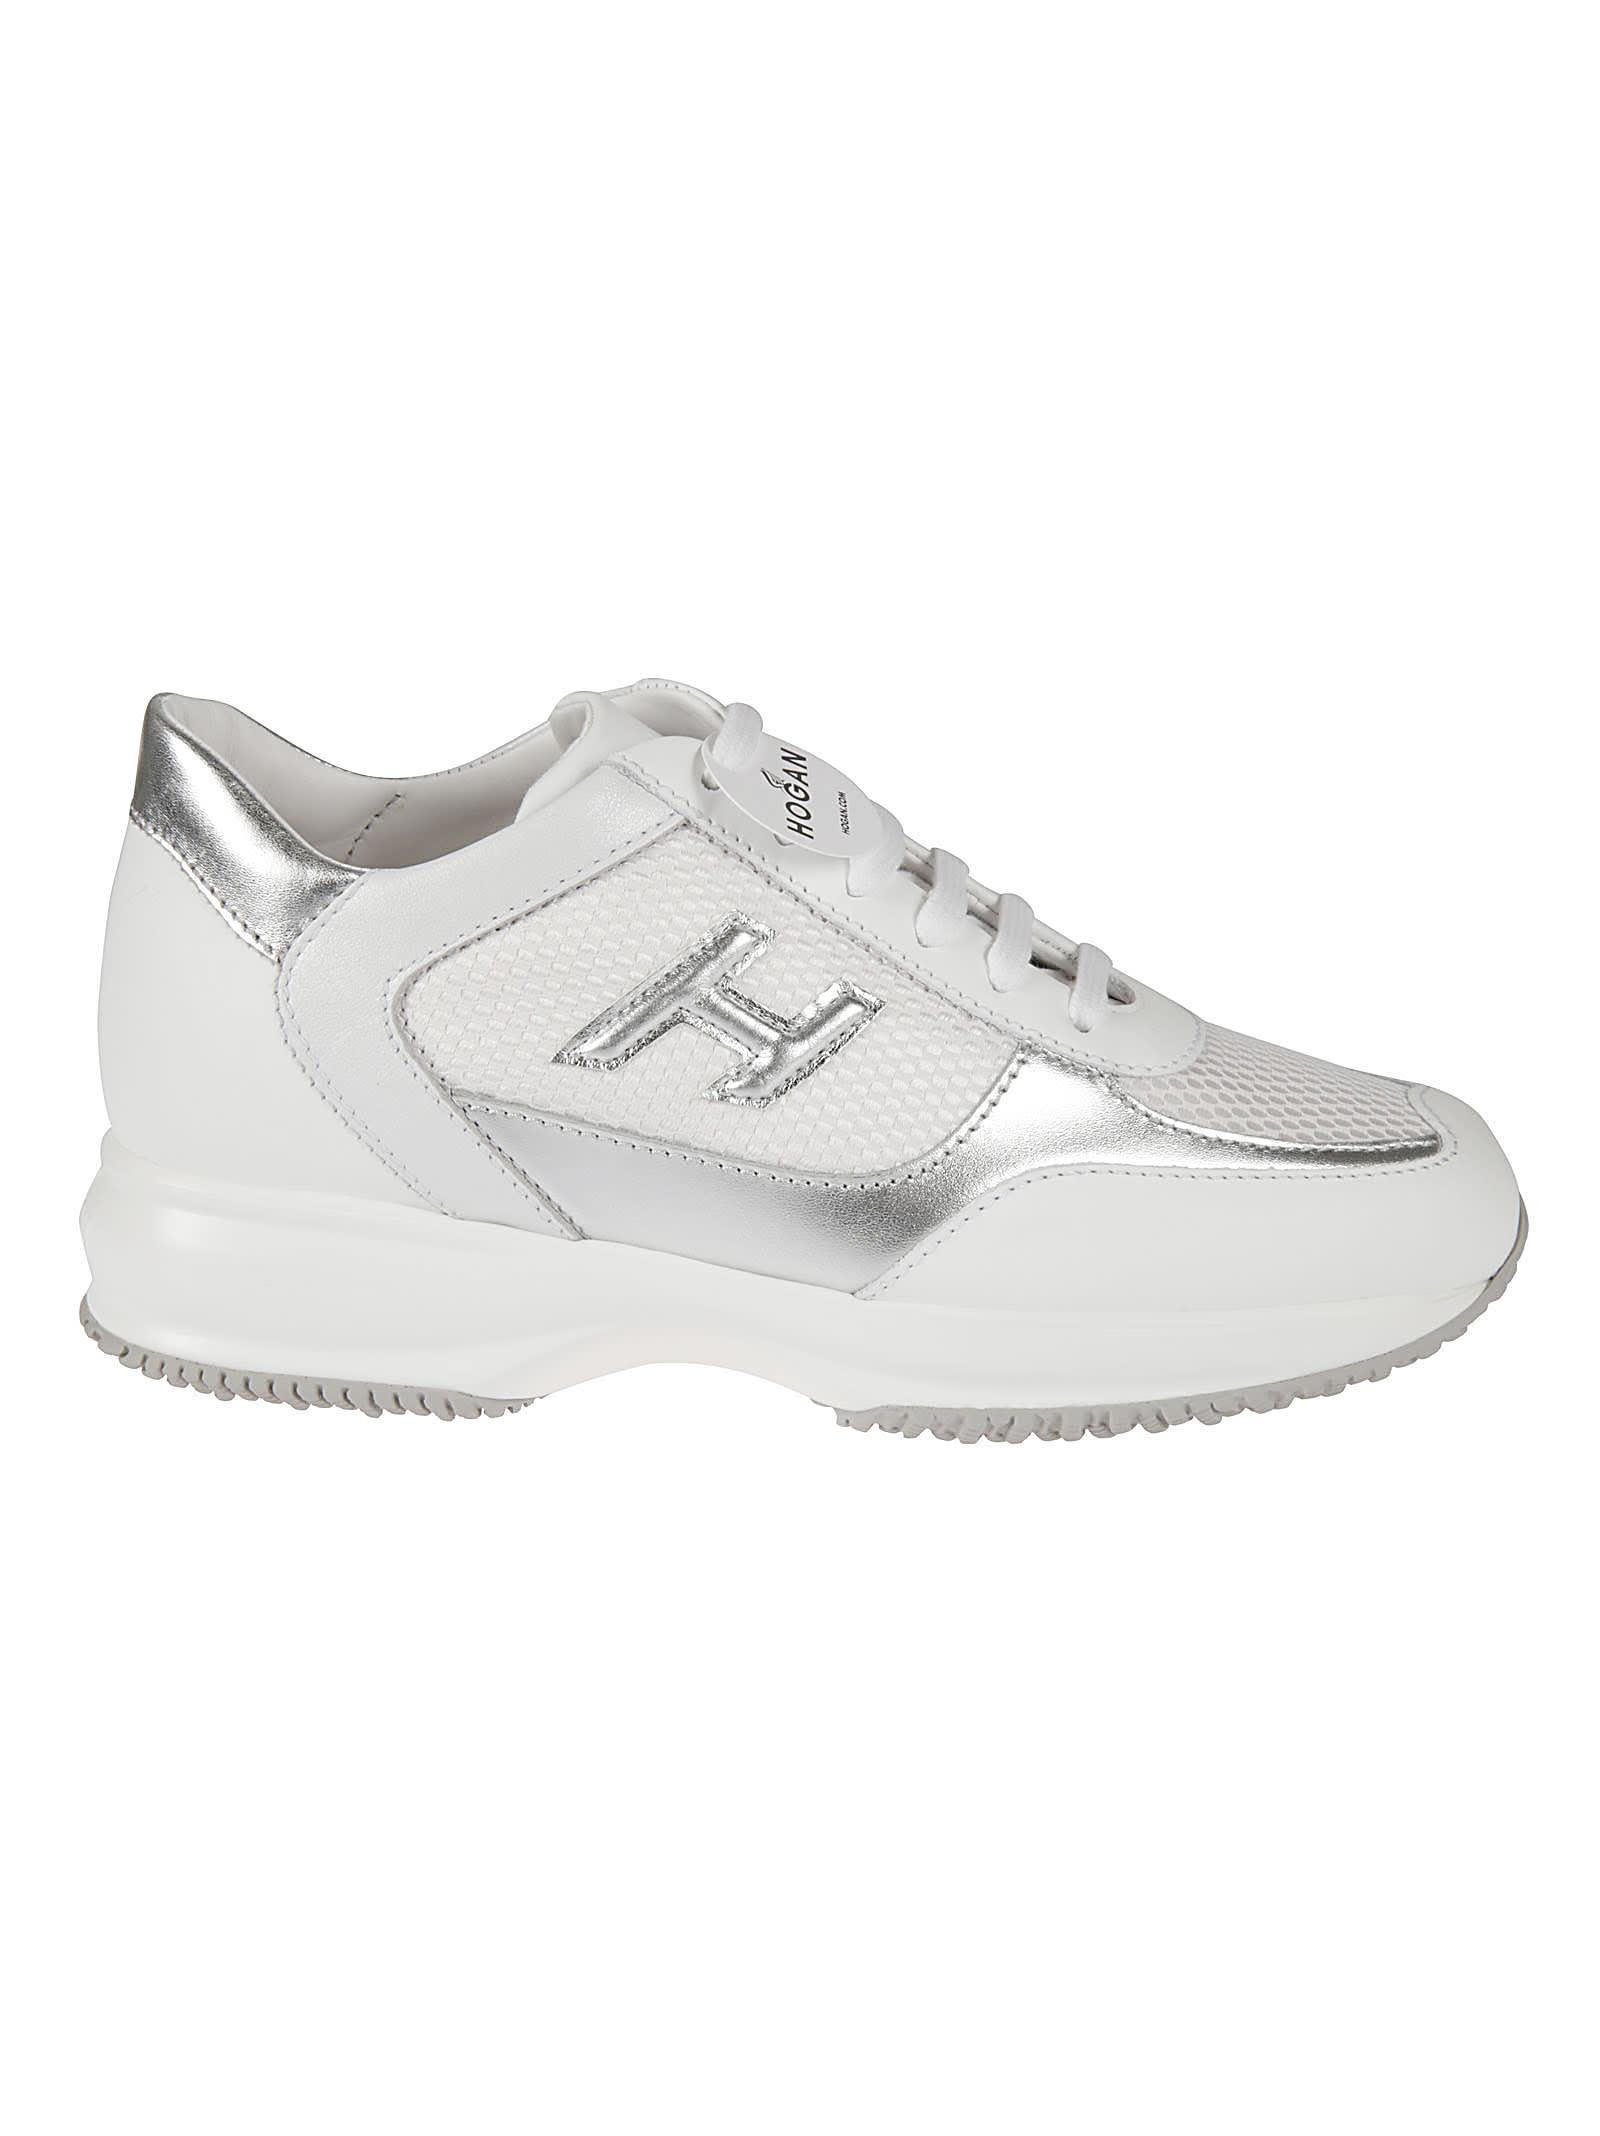 Hogan Sneakers INTERACTIVE SNEAKERS